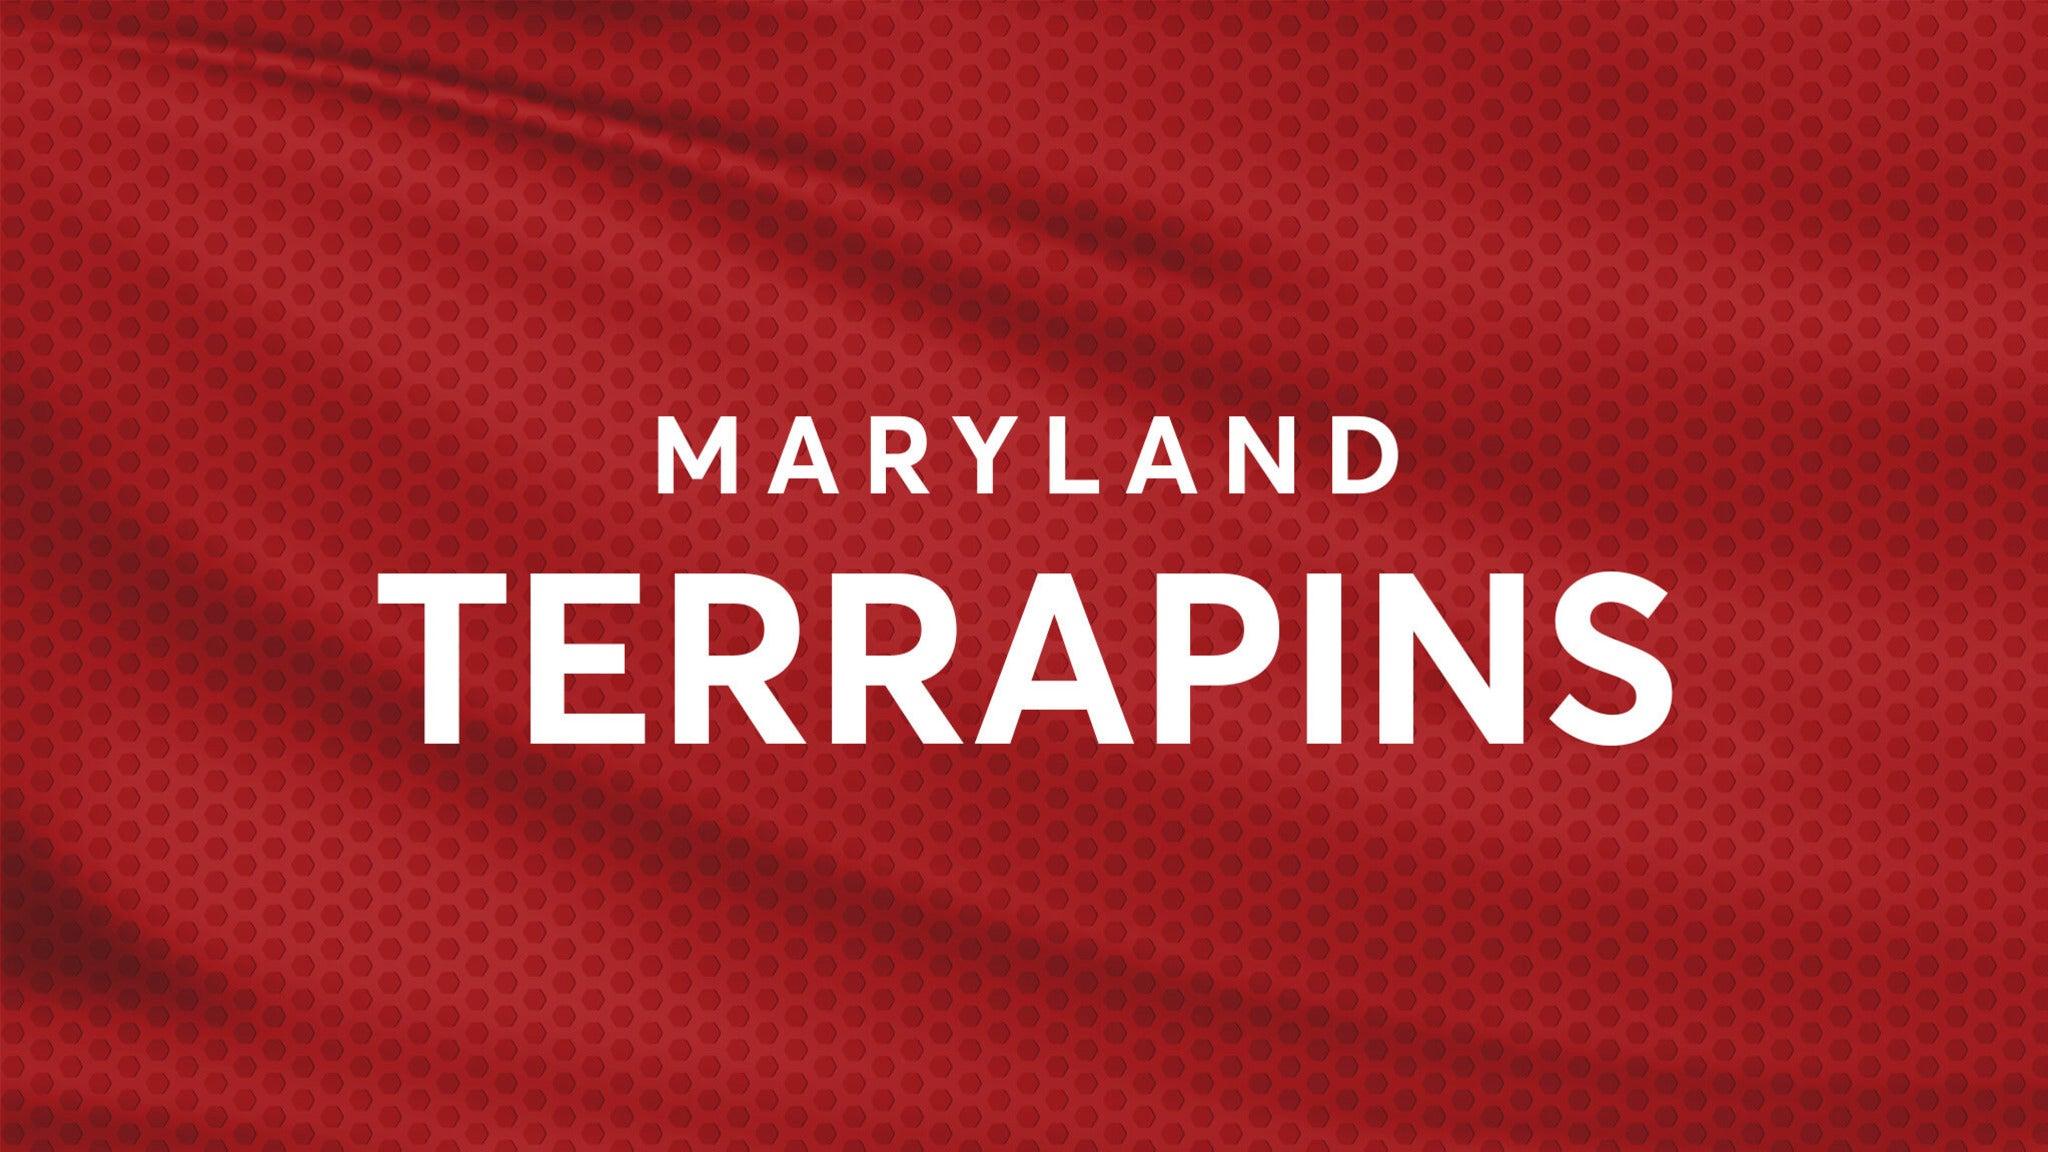 Maryland Terrapins Wrestling